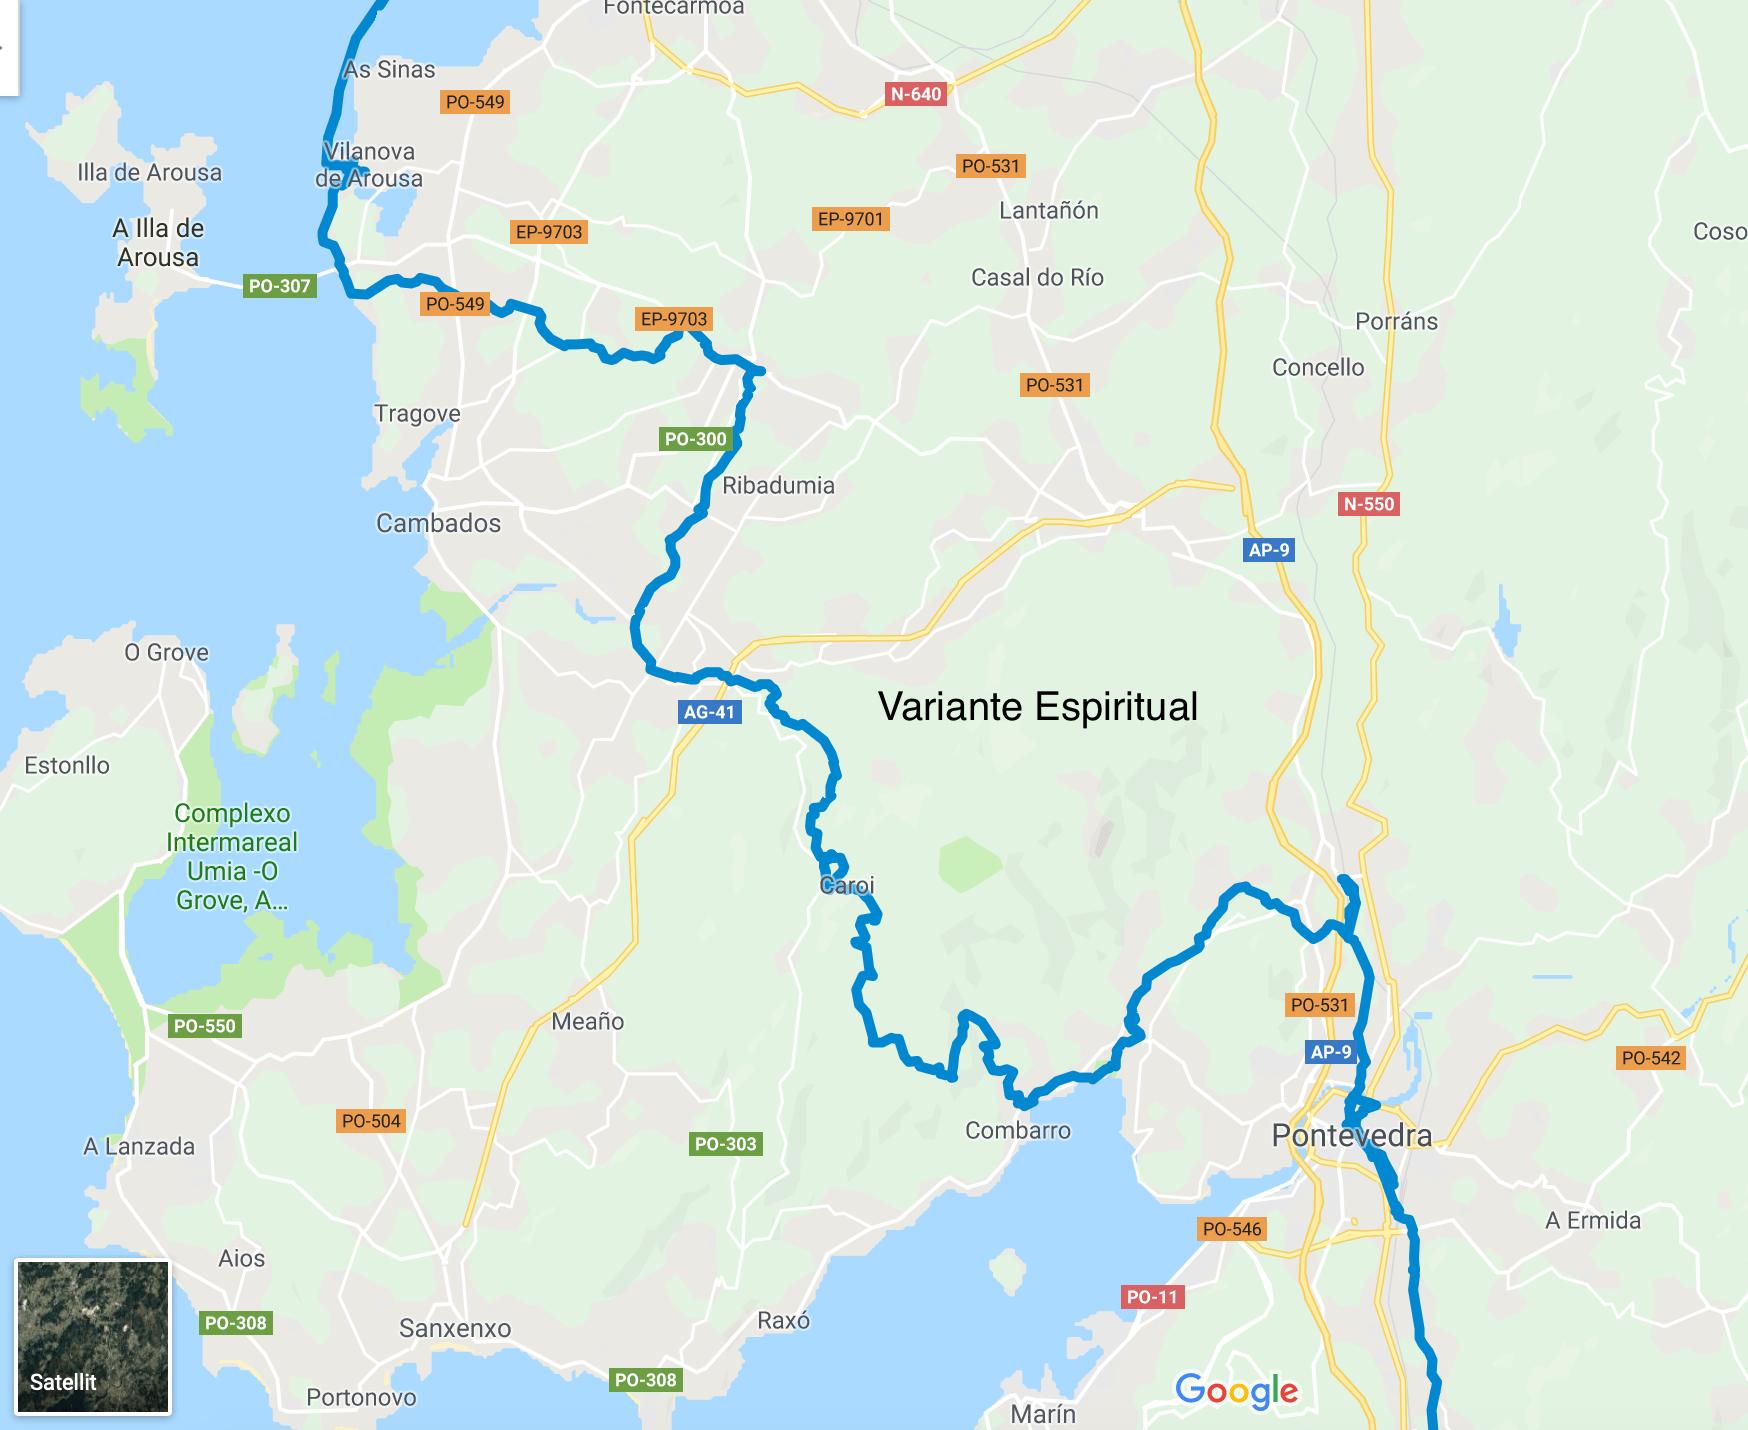 jakobsweg porto nach santiago de compostela küstenweg